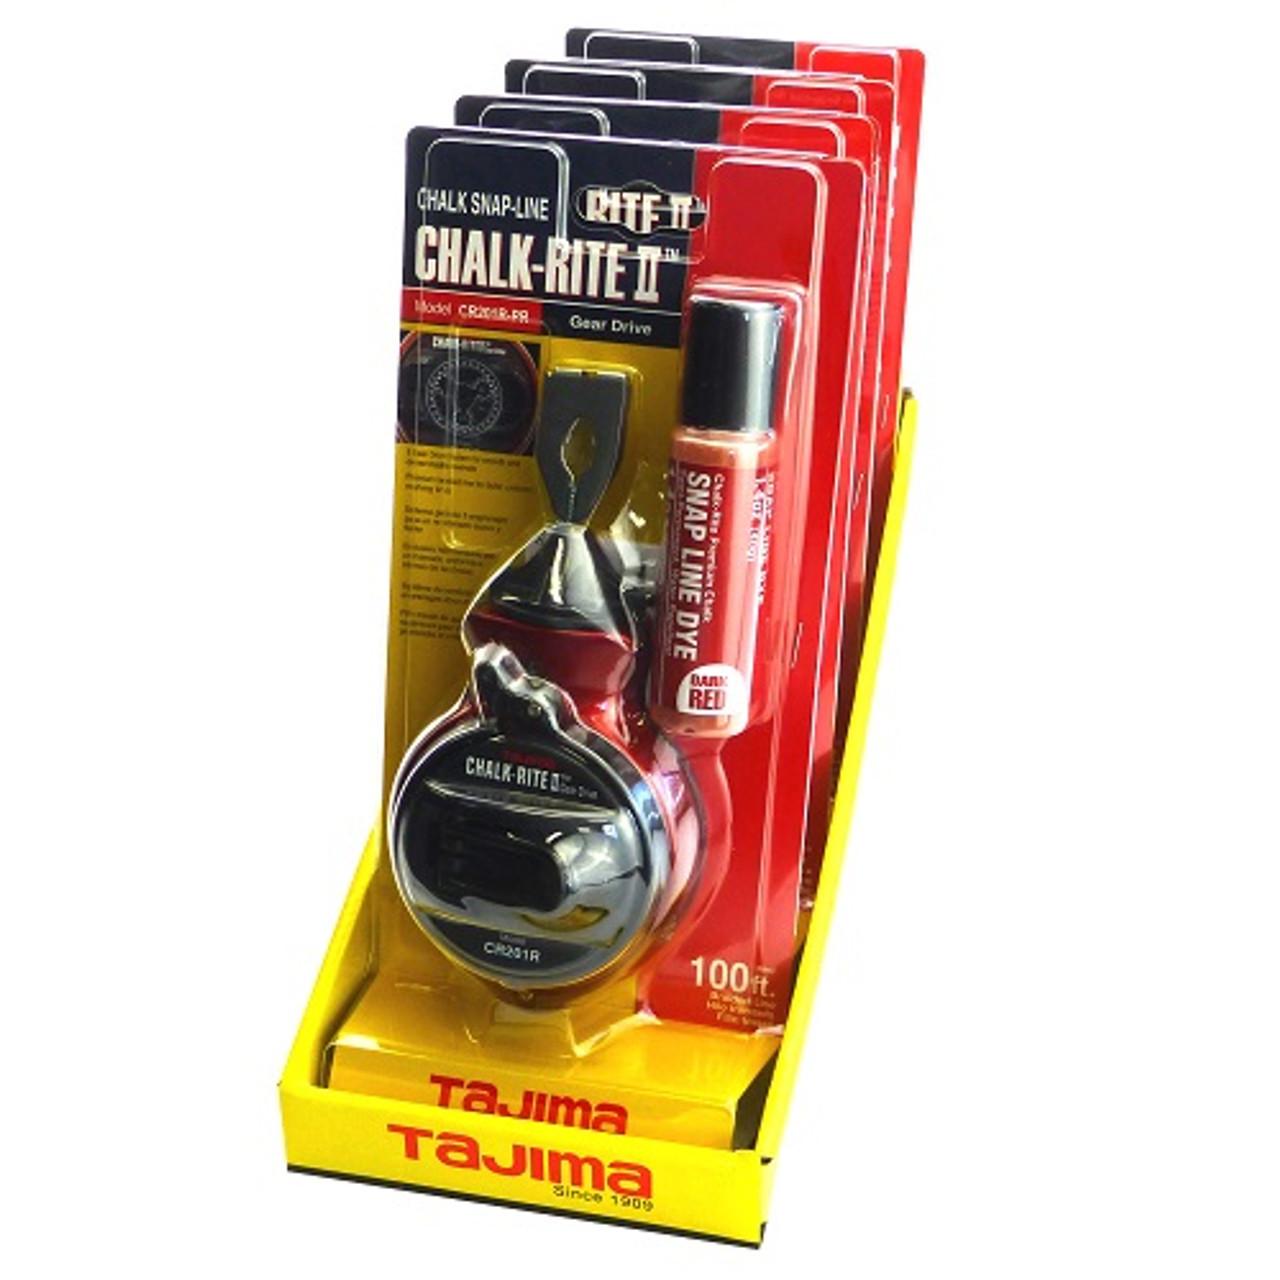 Chalk snap line Gear drive Chalk-Rite Tajima Japan